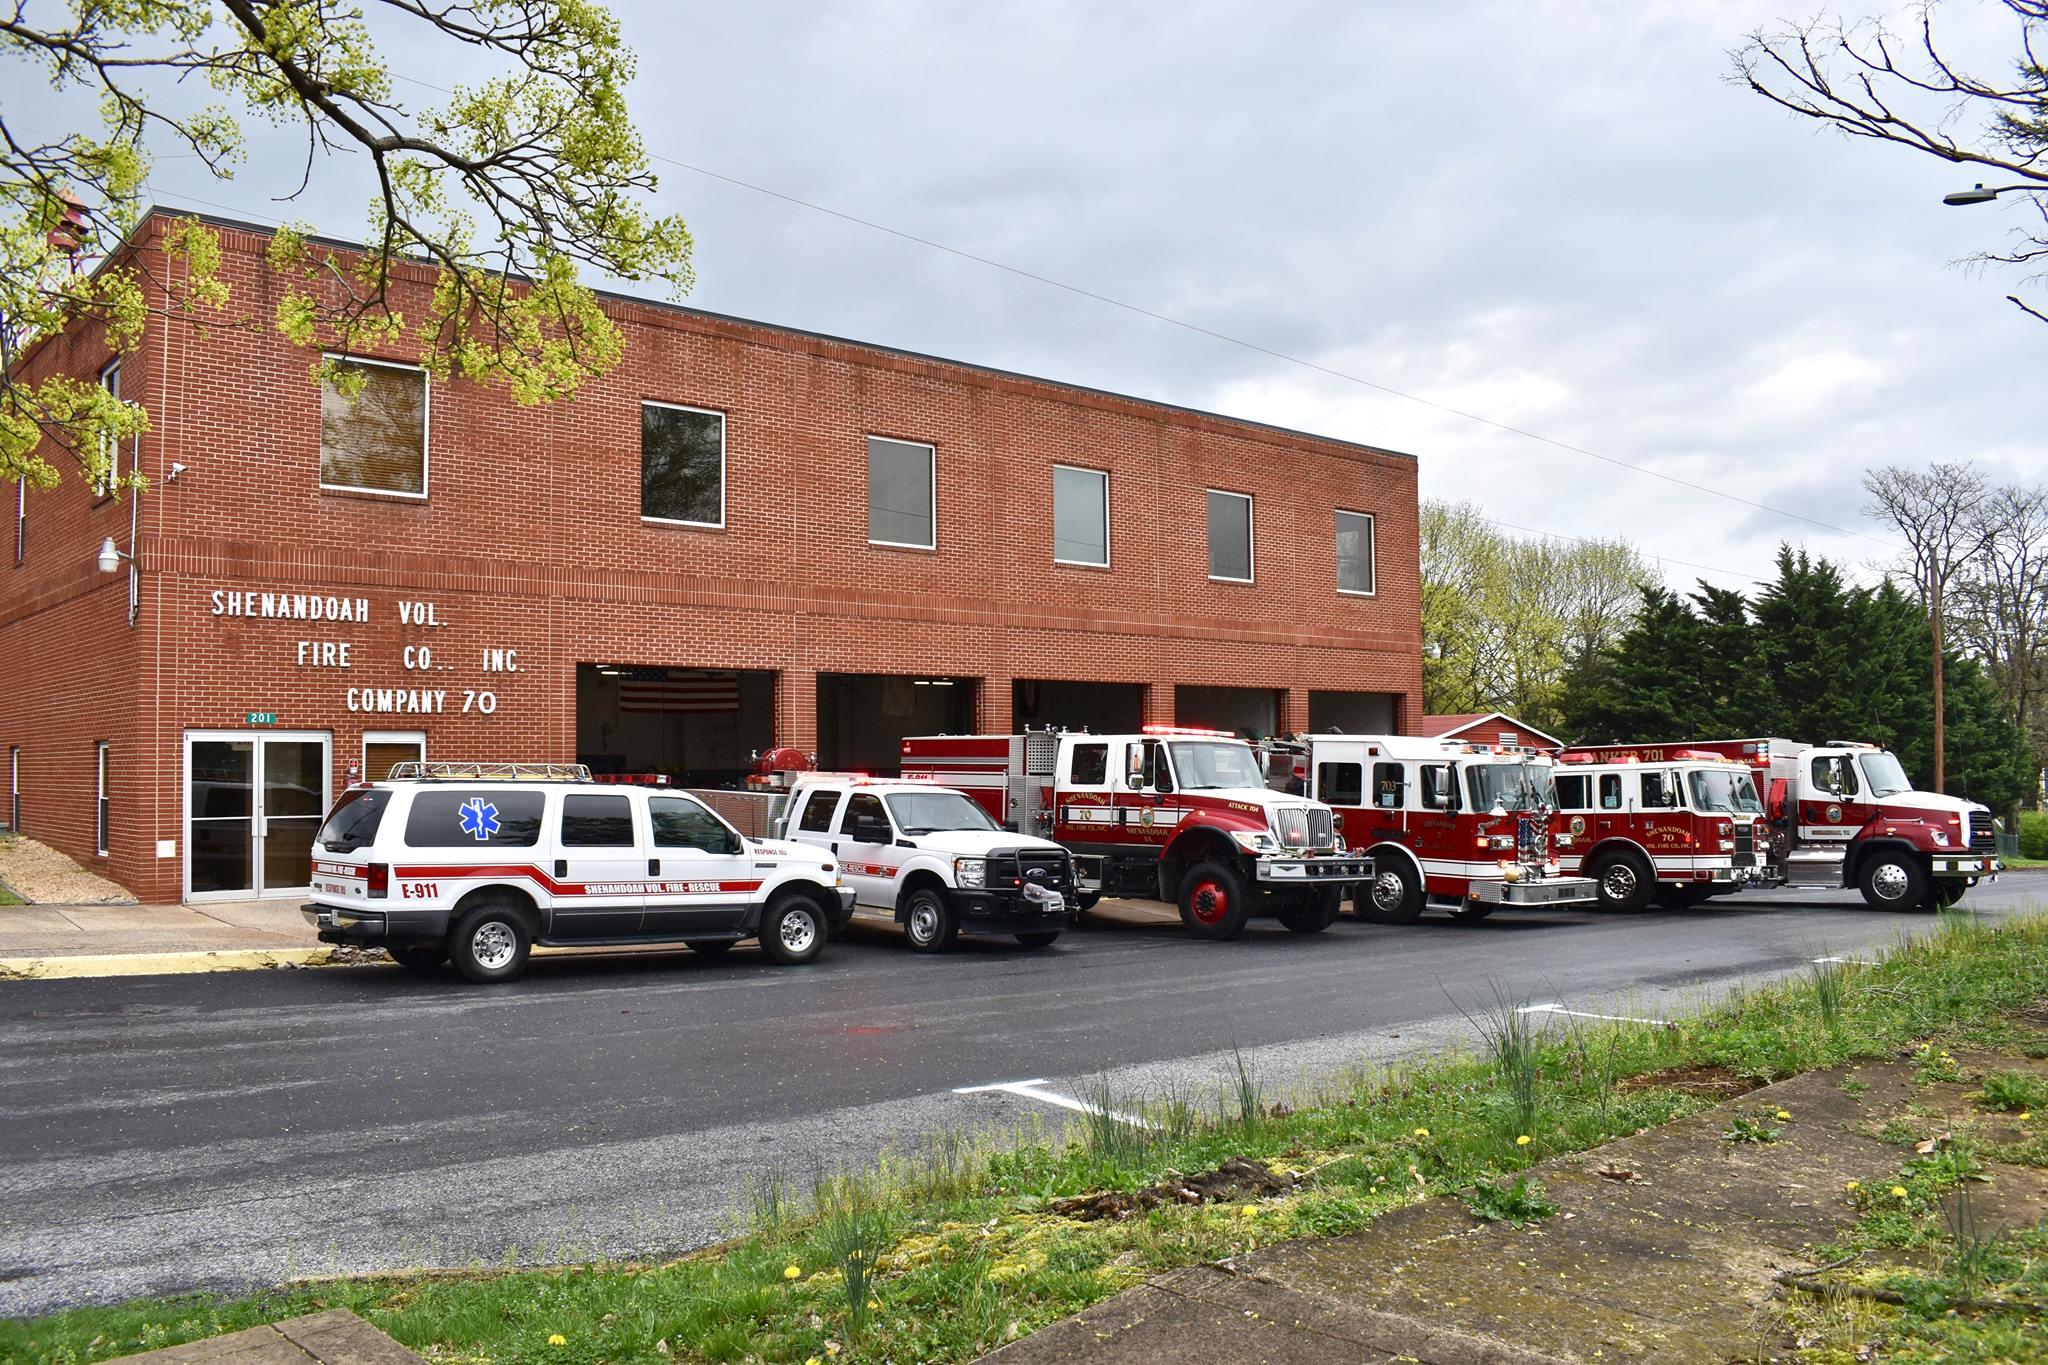 Shenandoah Volunteer Fire Company